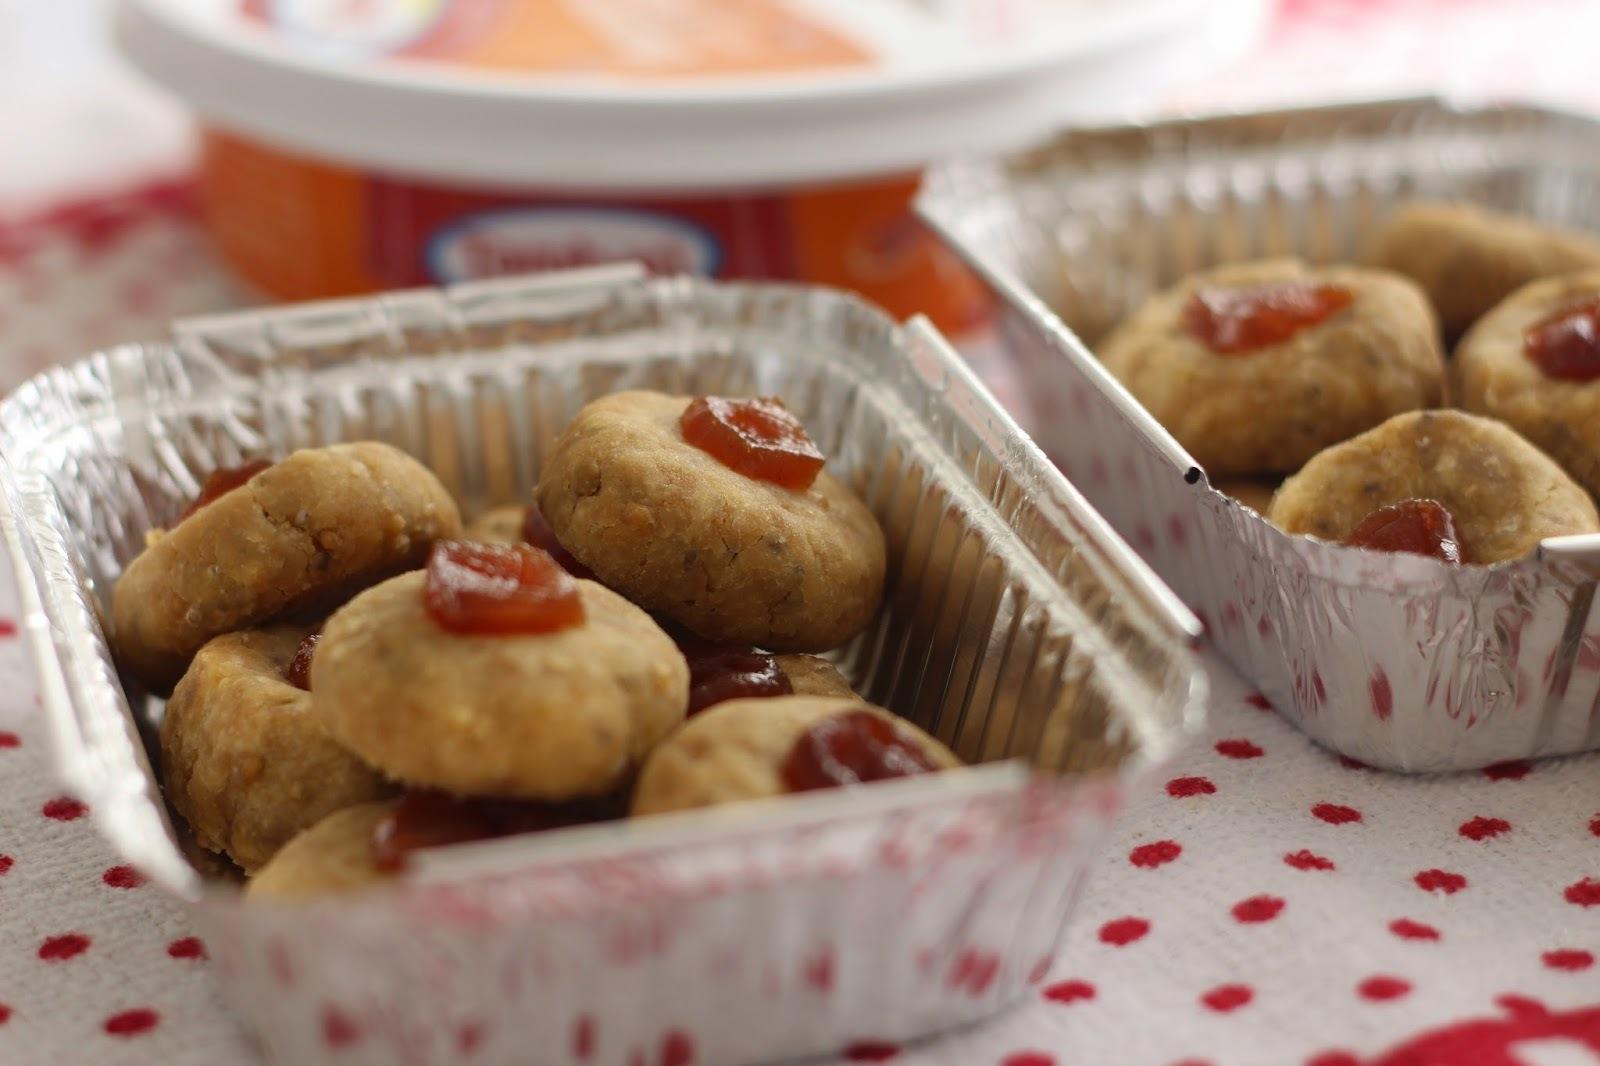 Biscoito amanteigado #vegano #lactofree #glutenfree